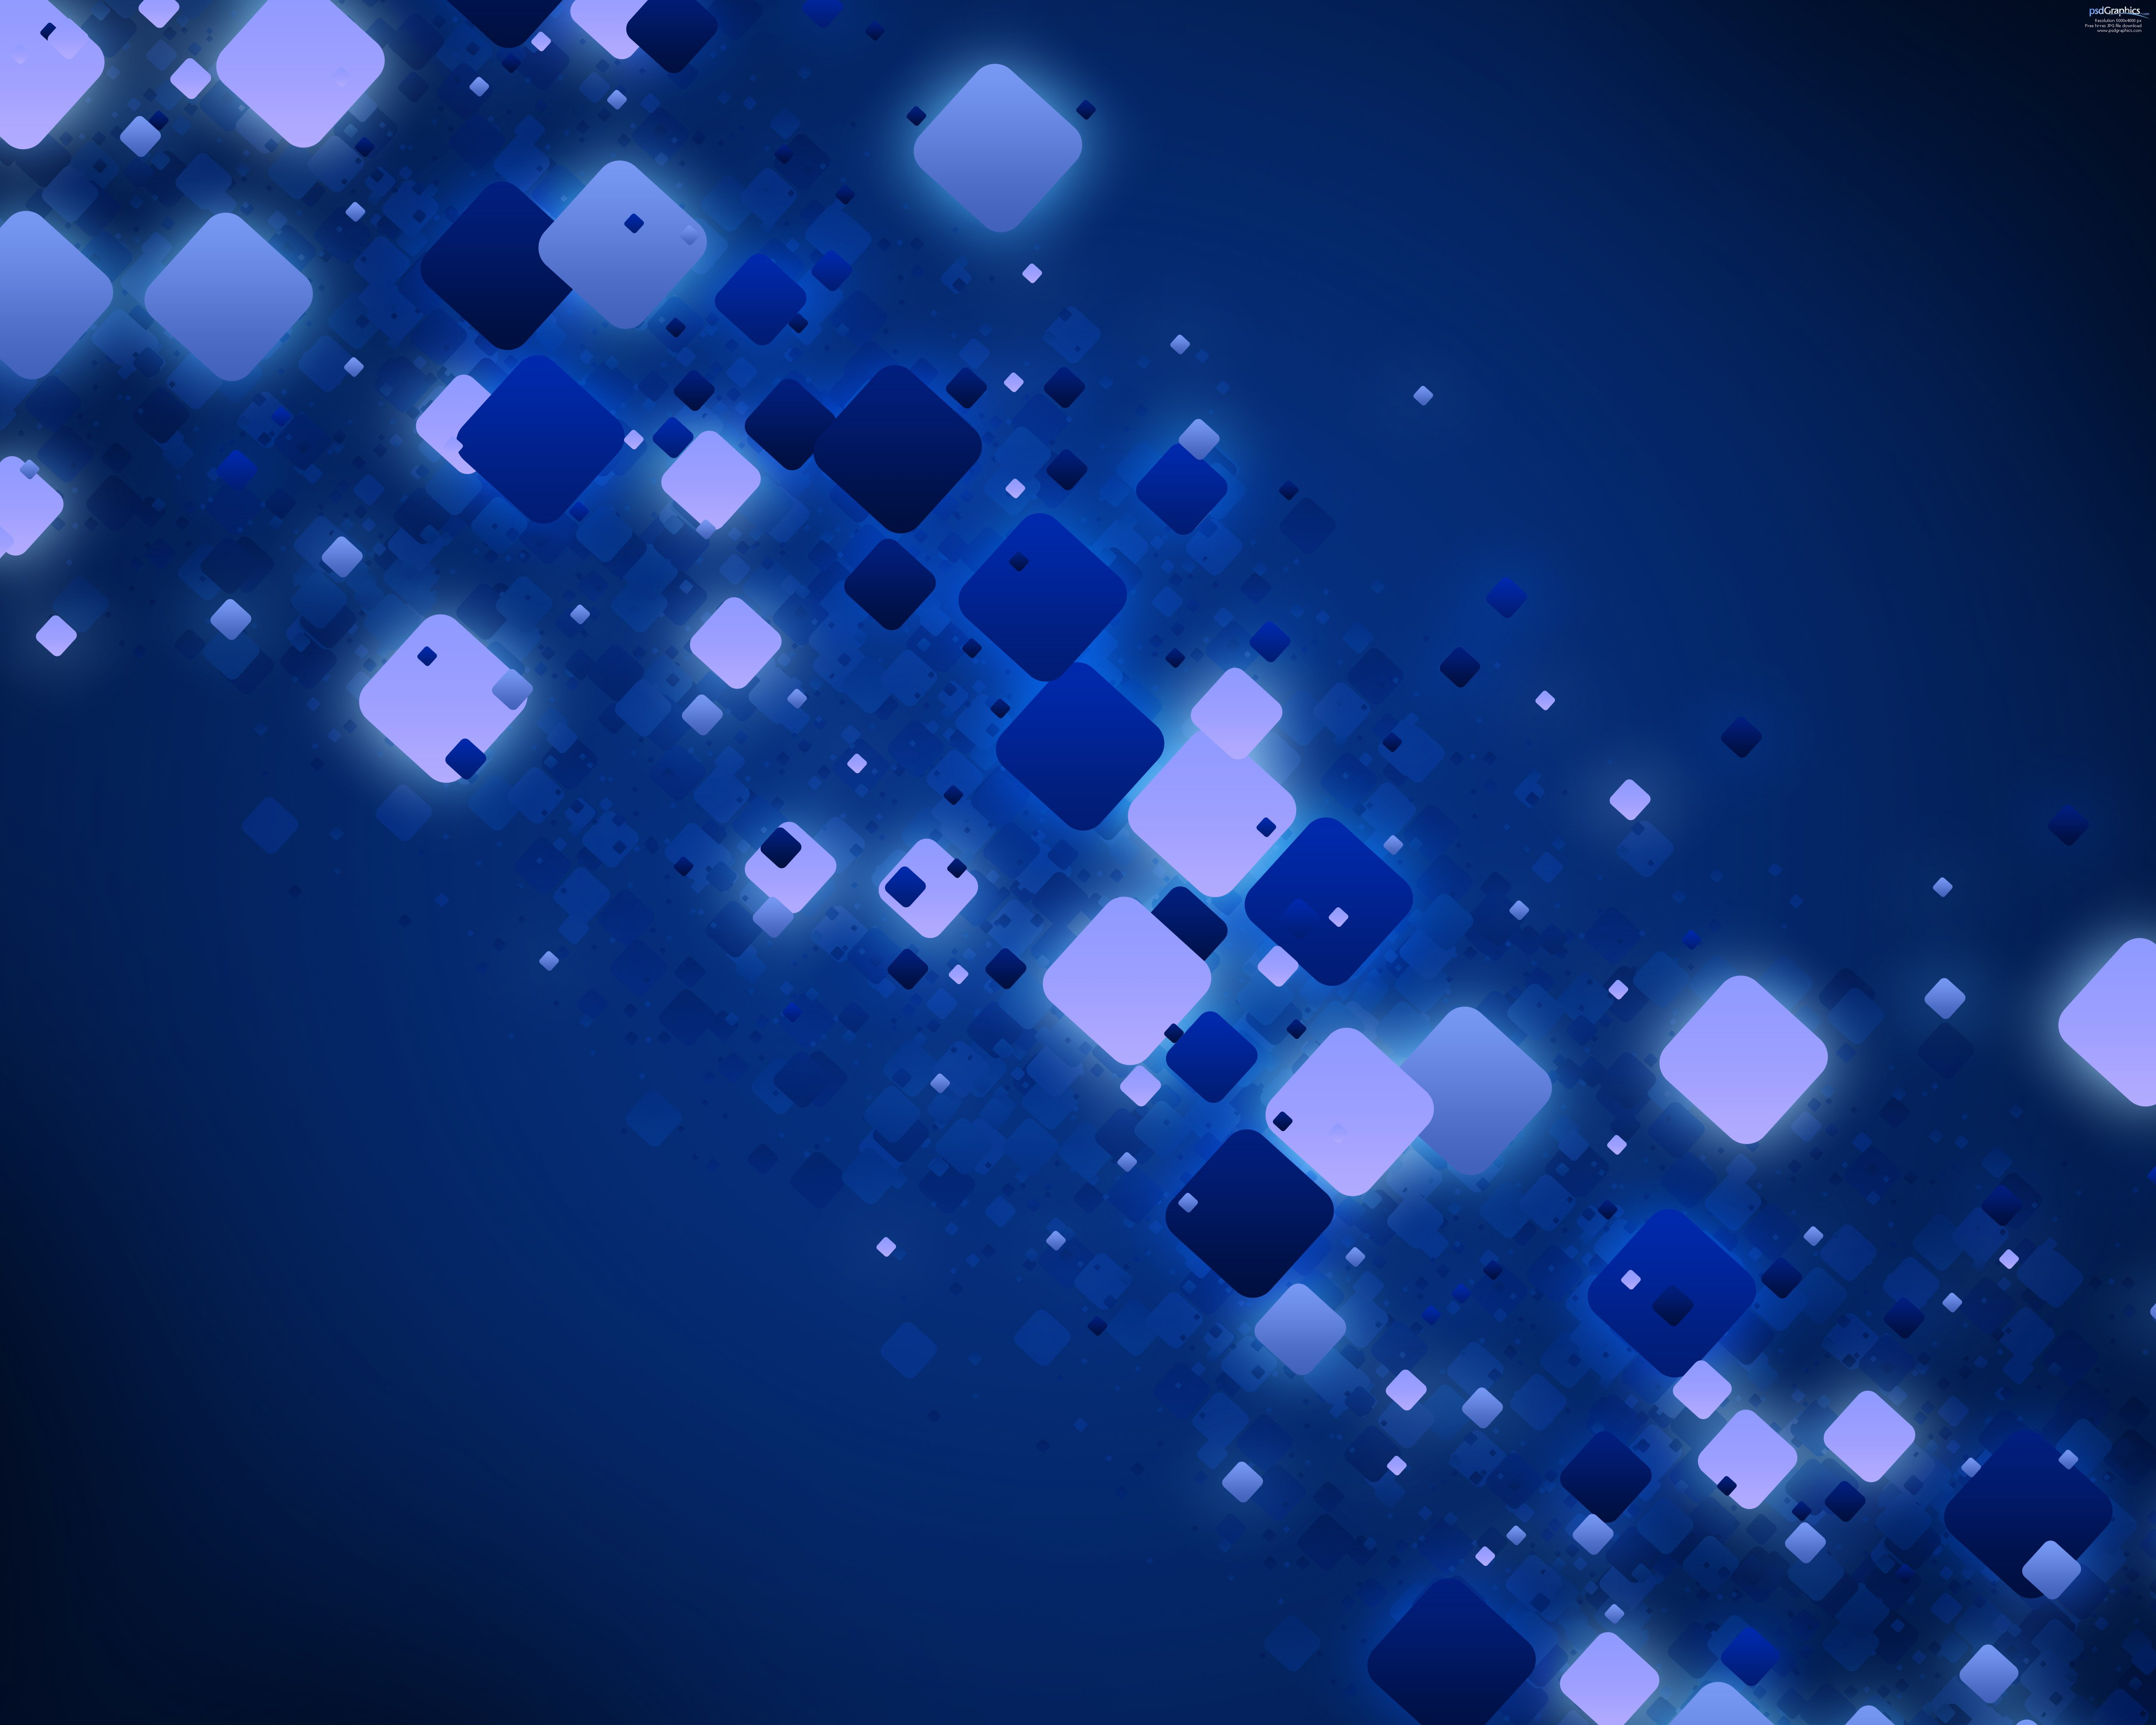 blue wallpaper background wallpapersafari